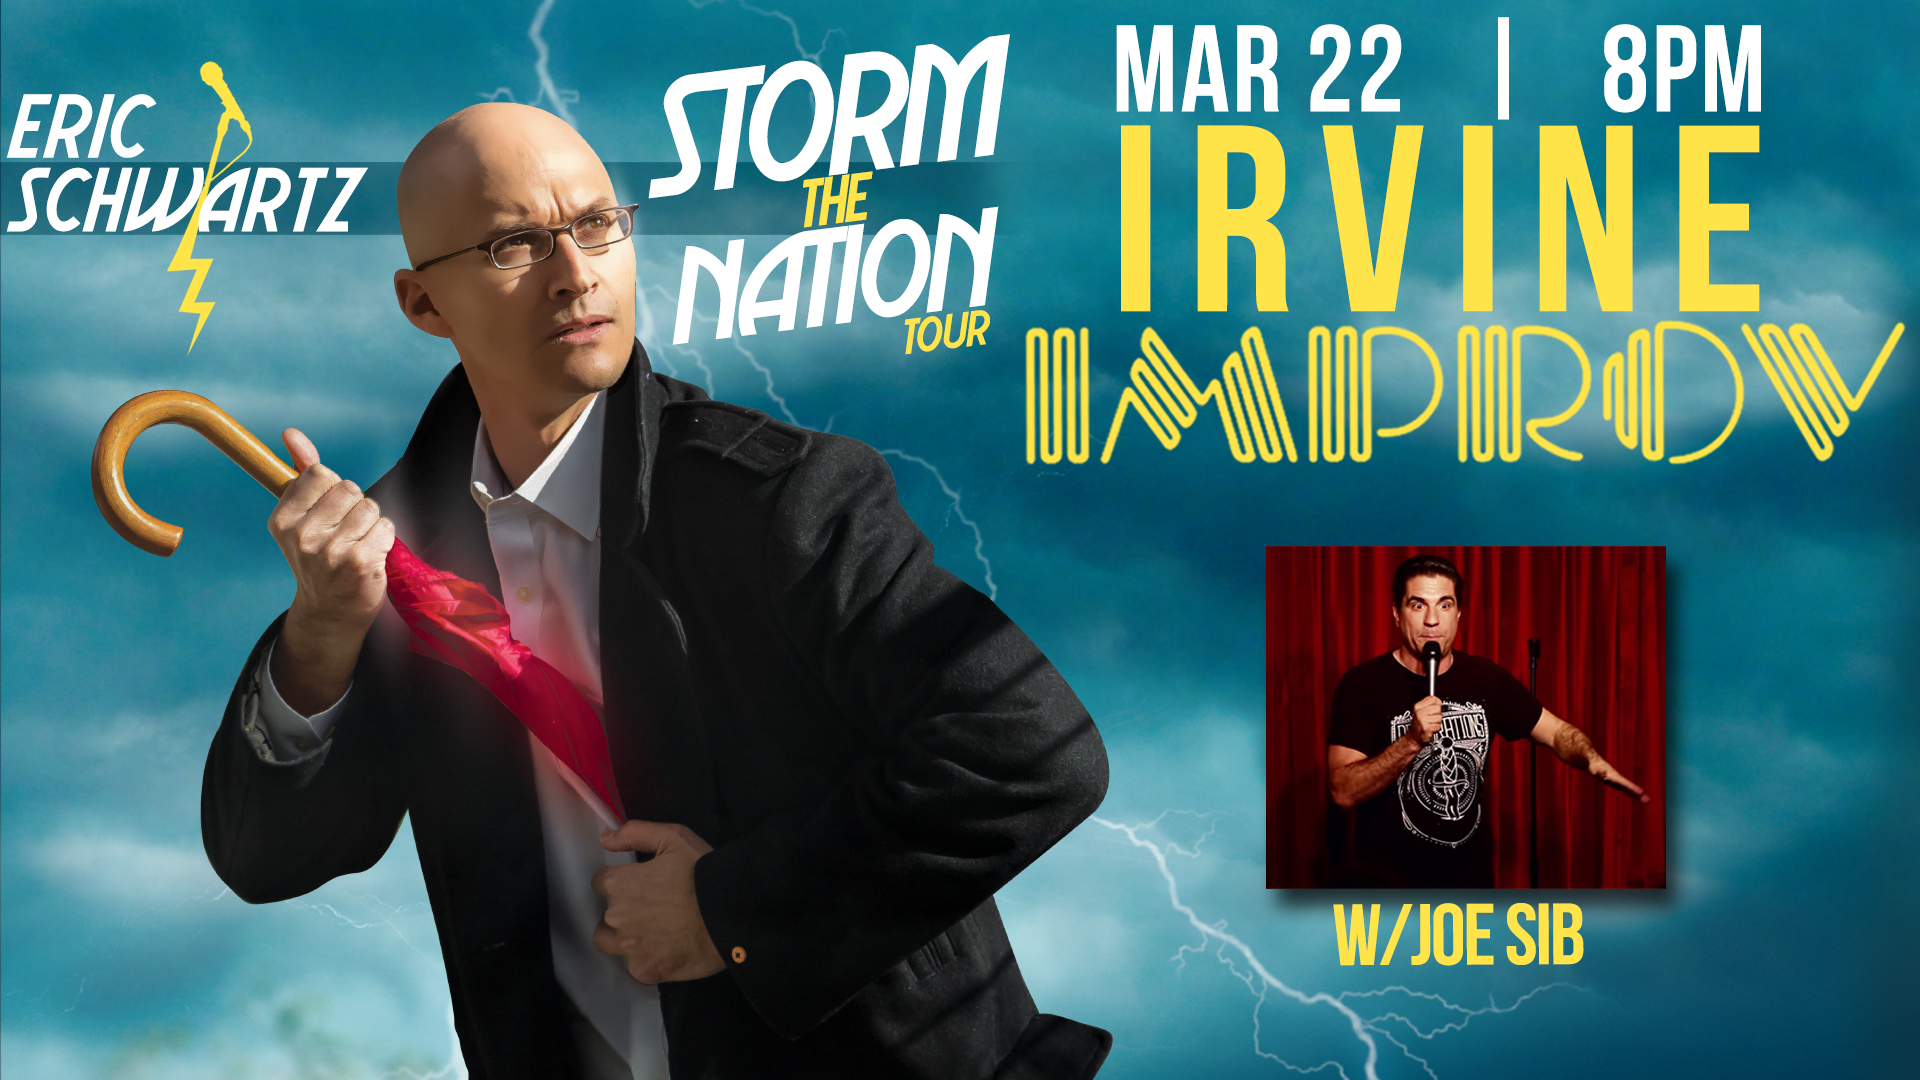 stormthenationfb-irvine